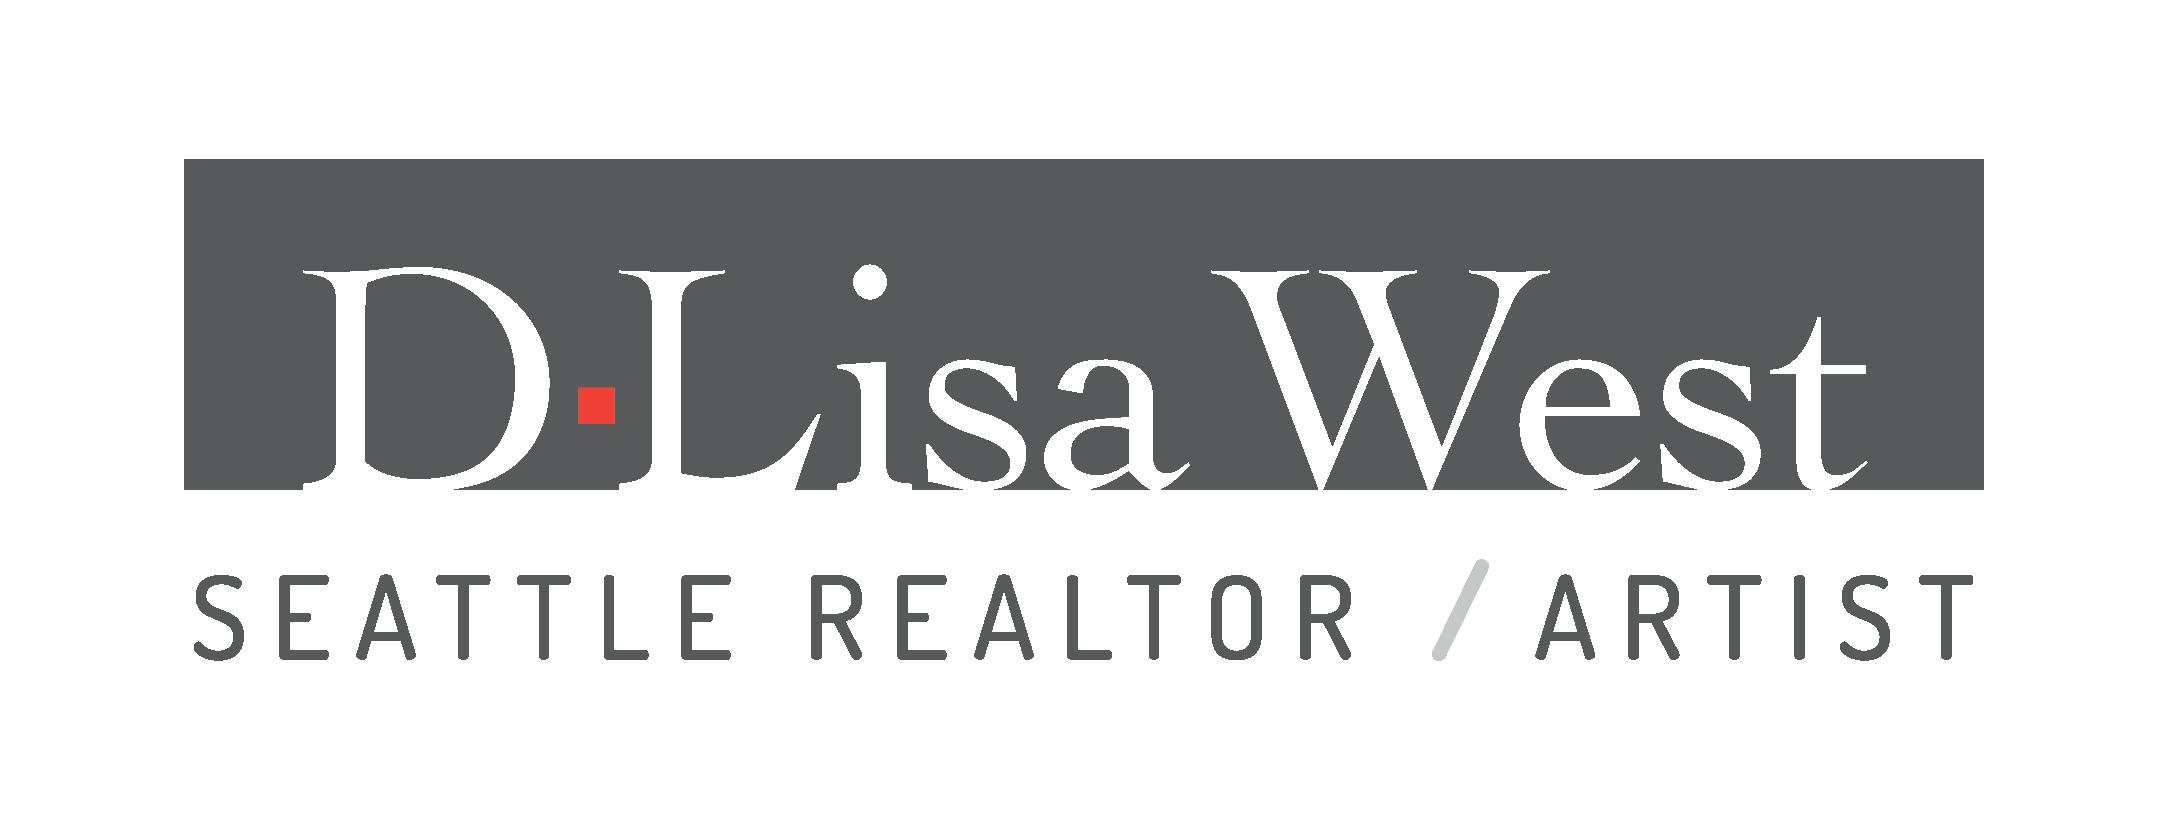 Logo for D.Lisa West, Seattle REALTOR/ARTIST